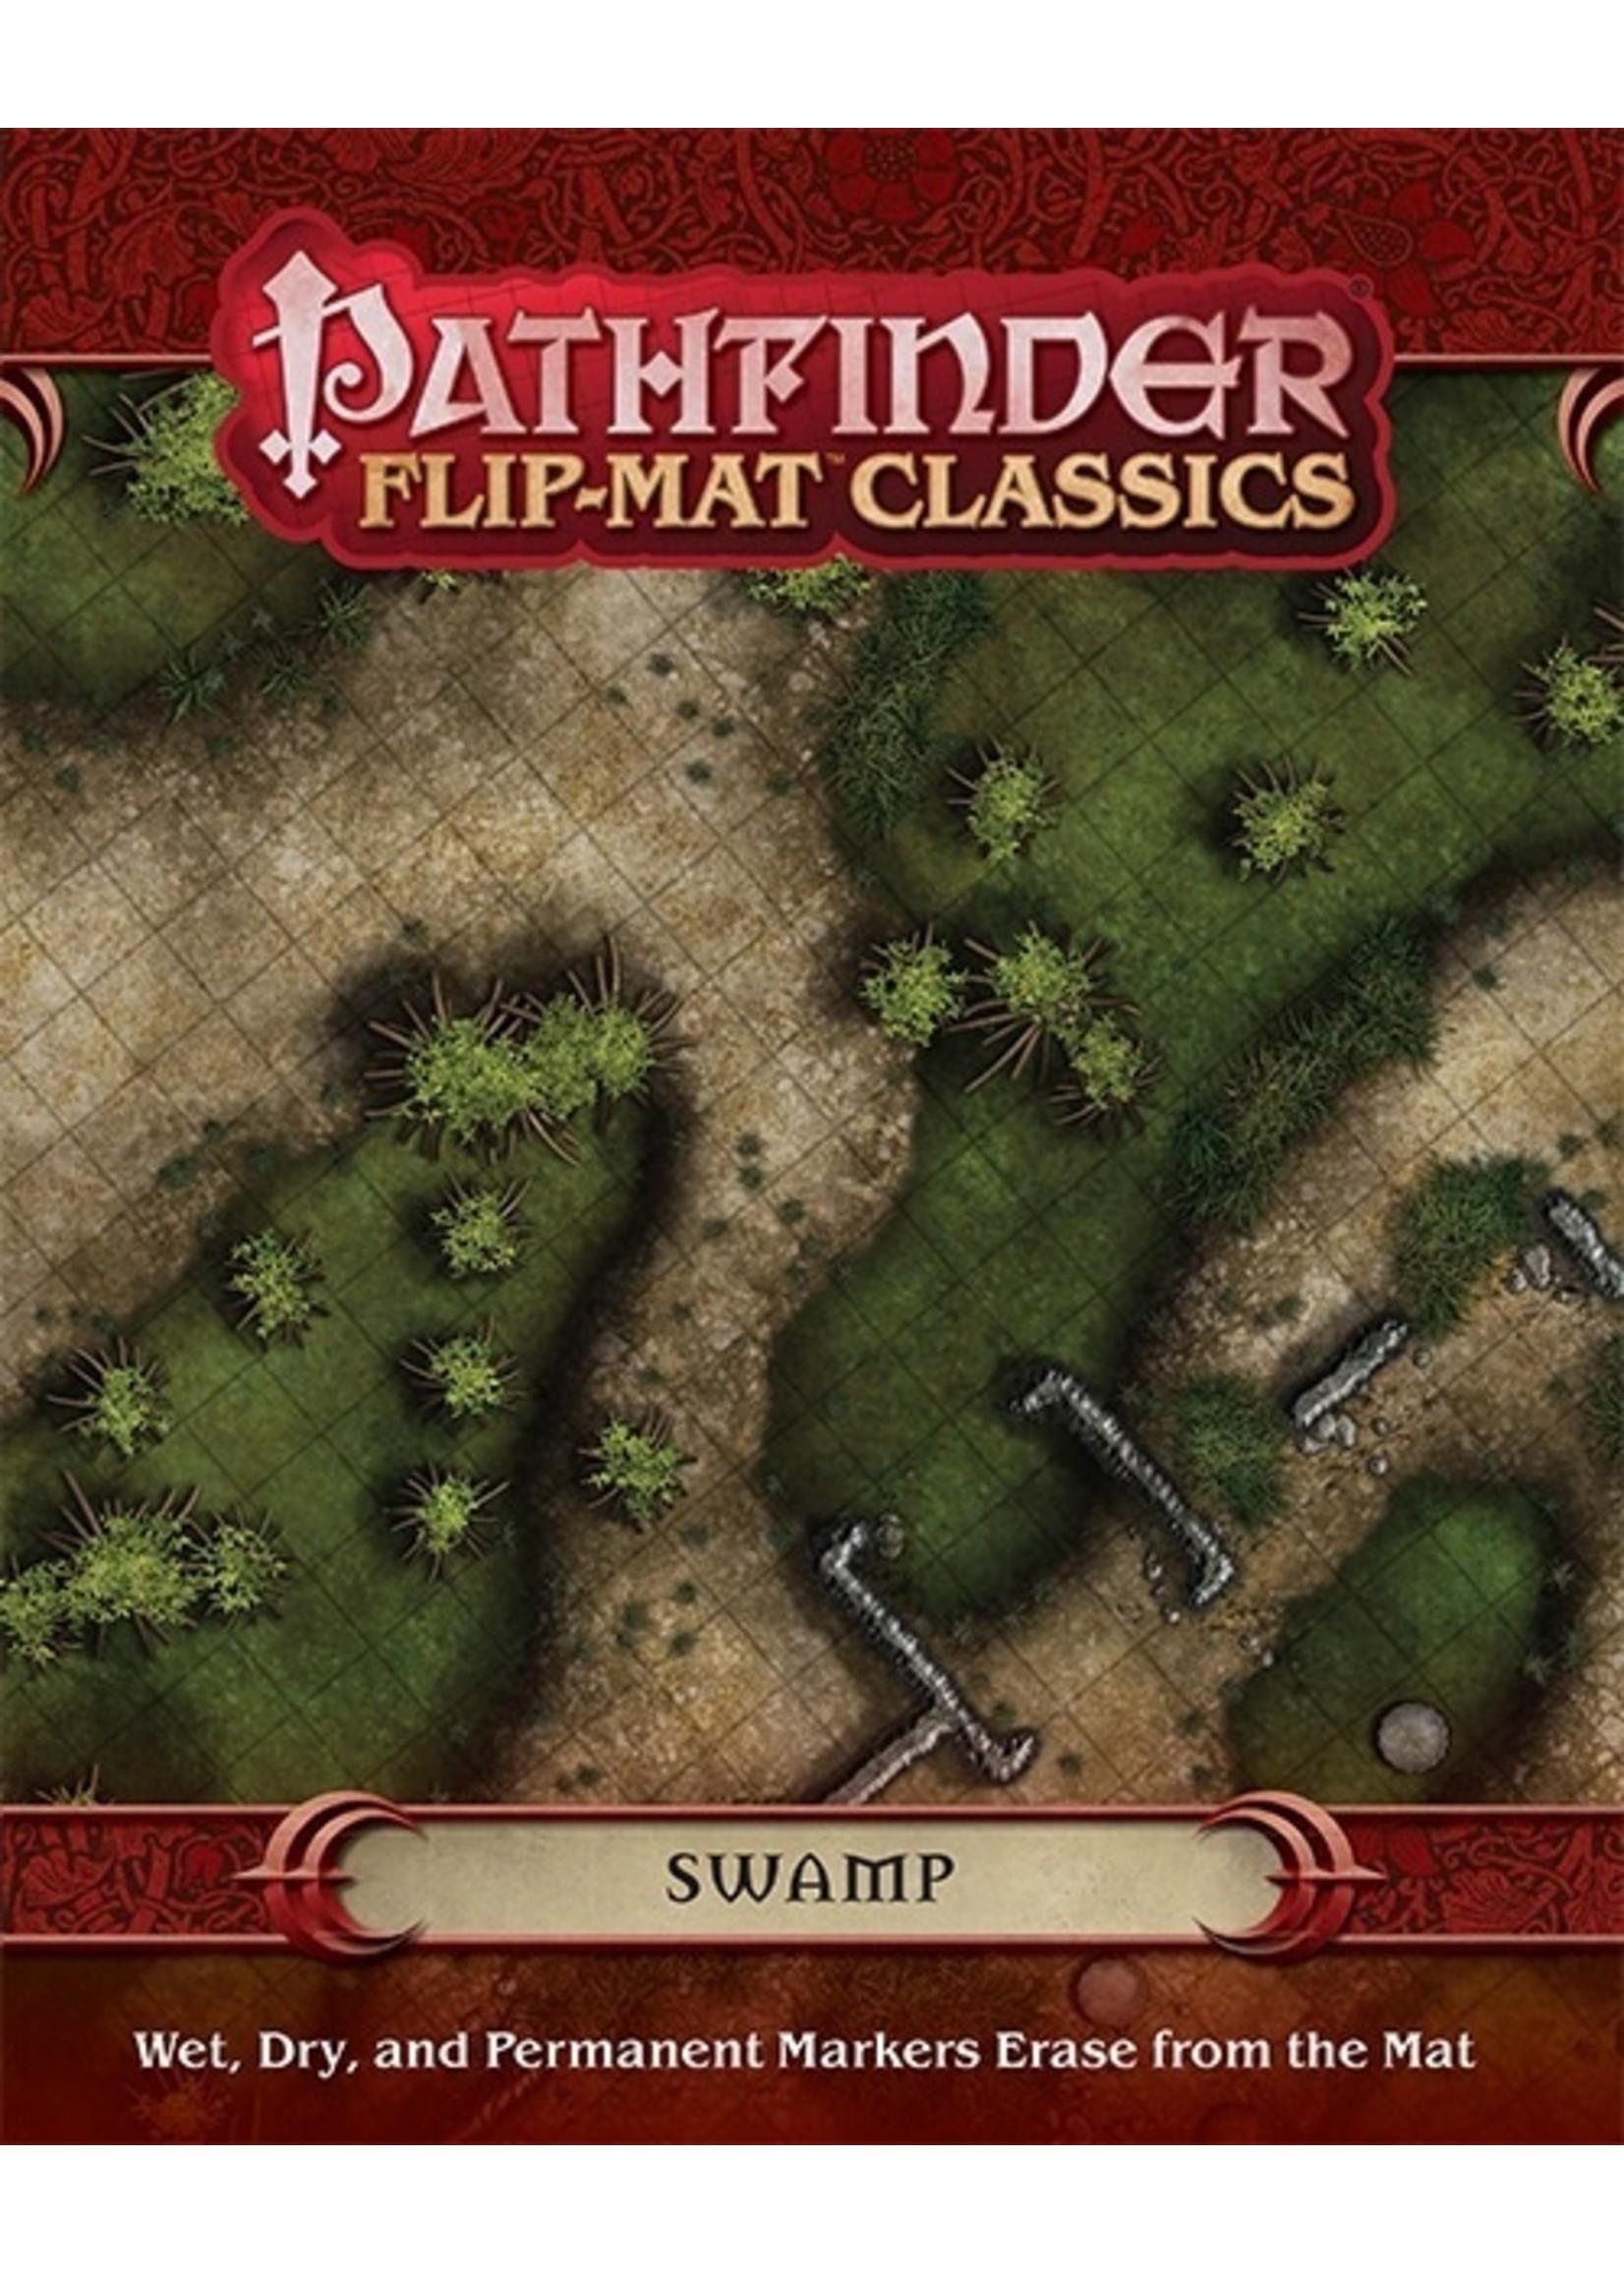 Pathfinder RPG: Flip-Mat - Classics - Swamp